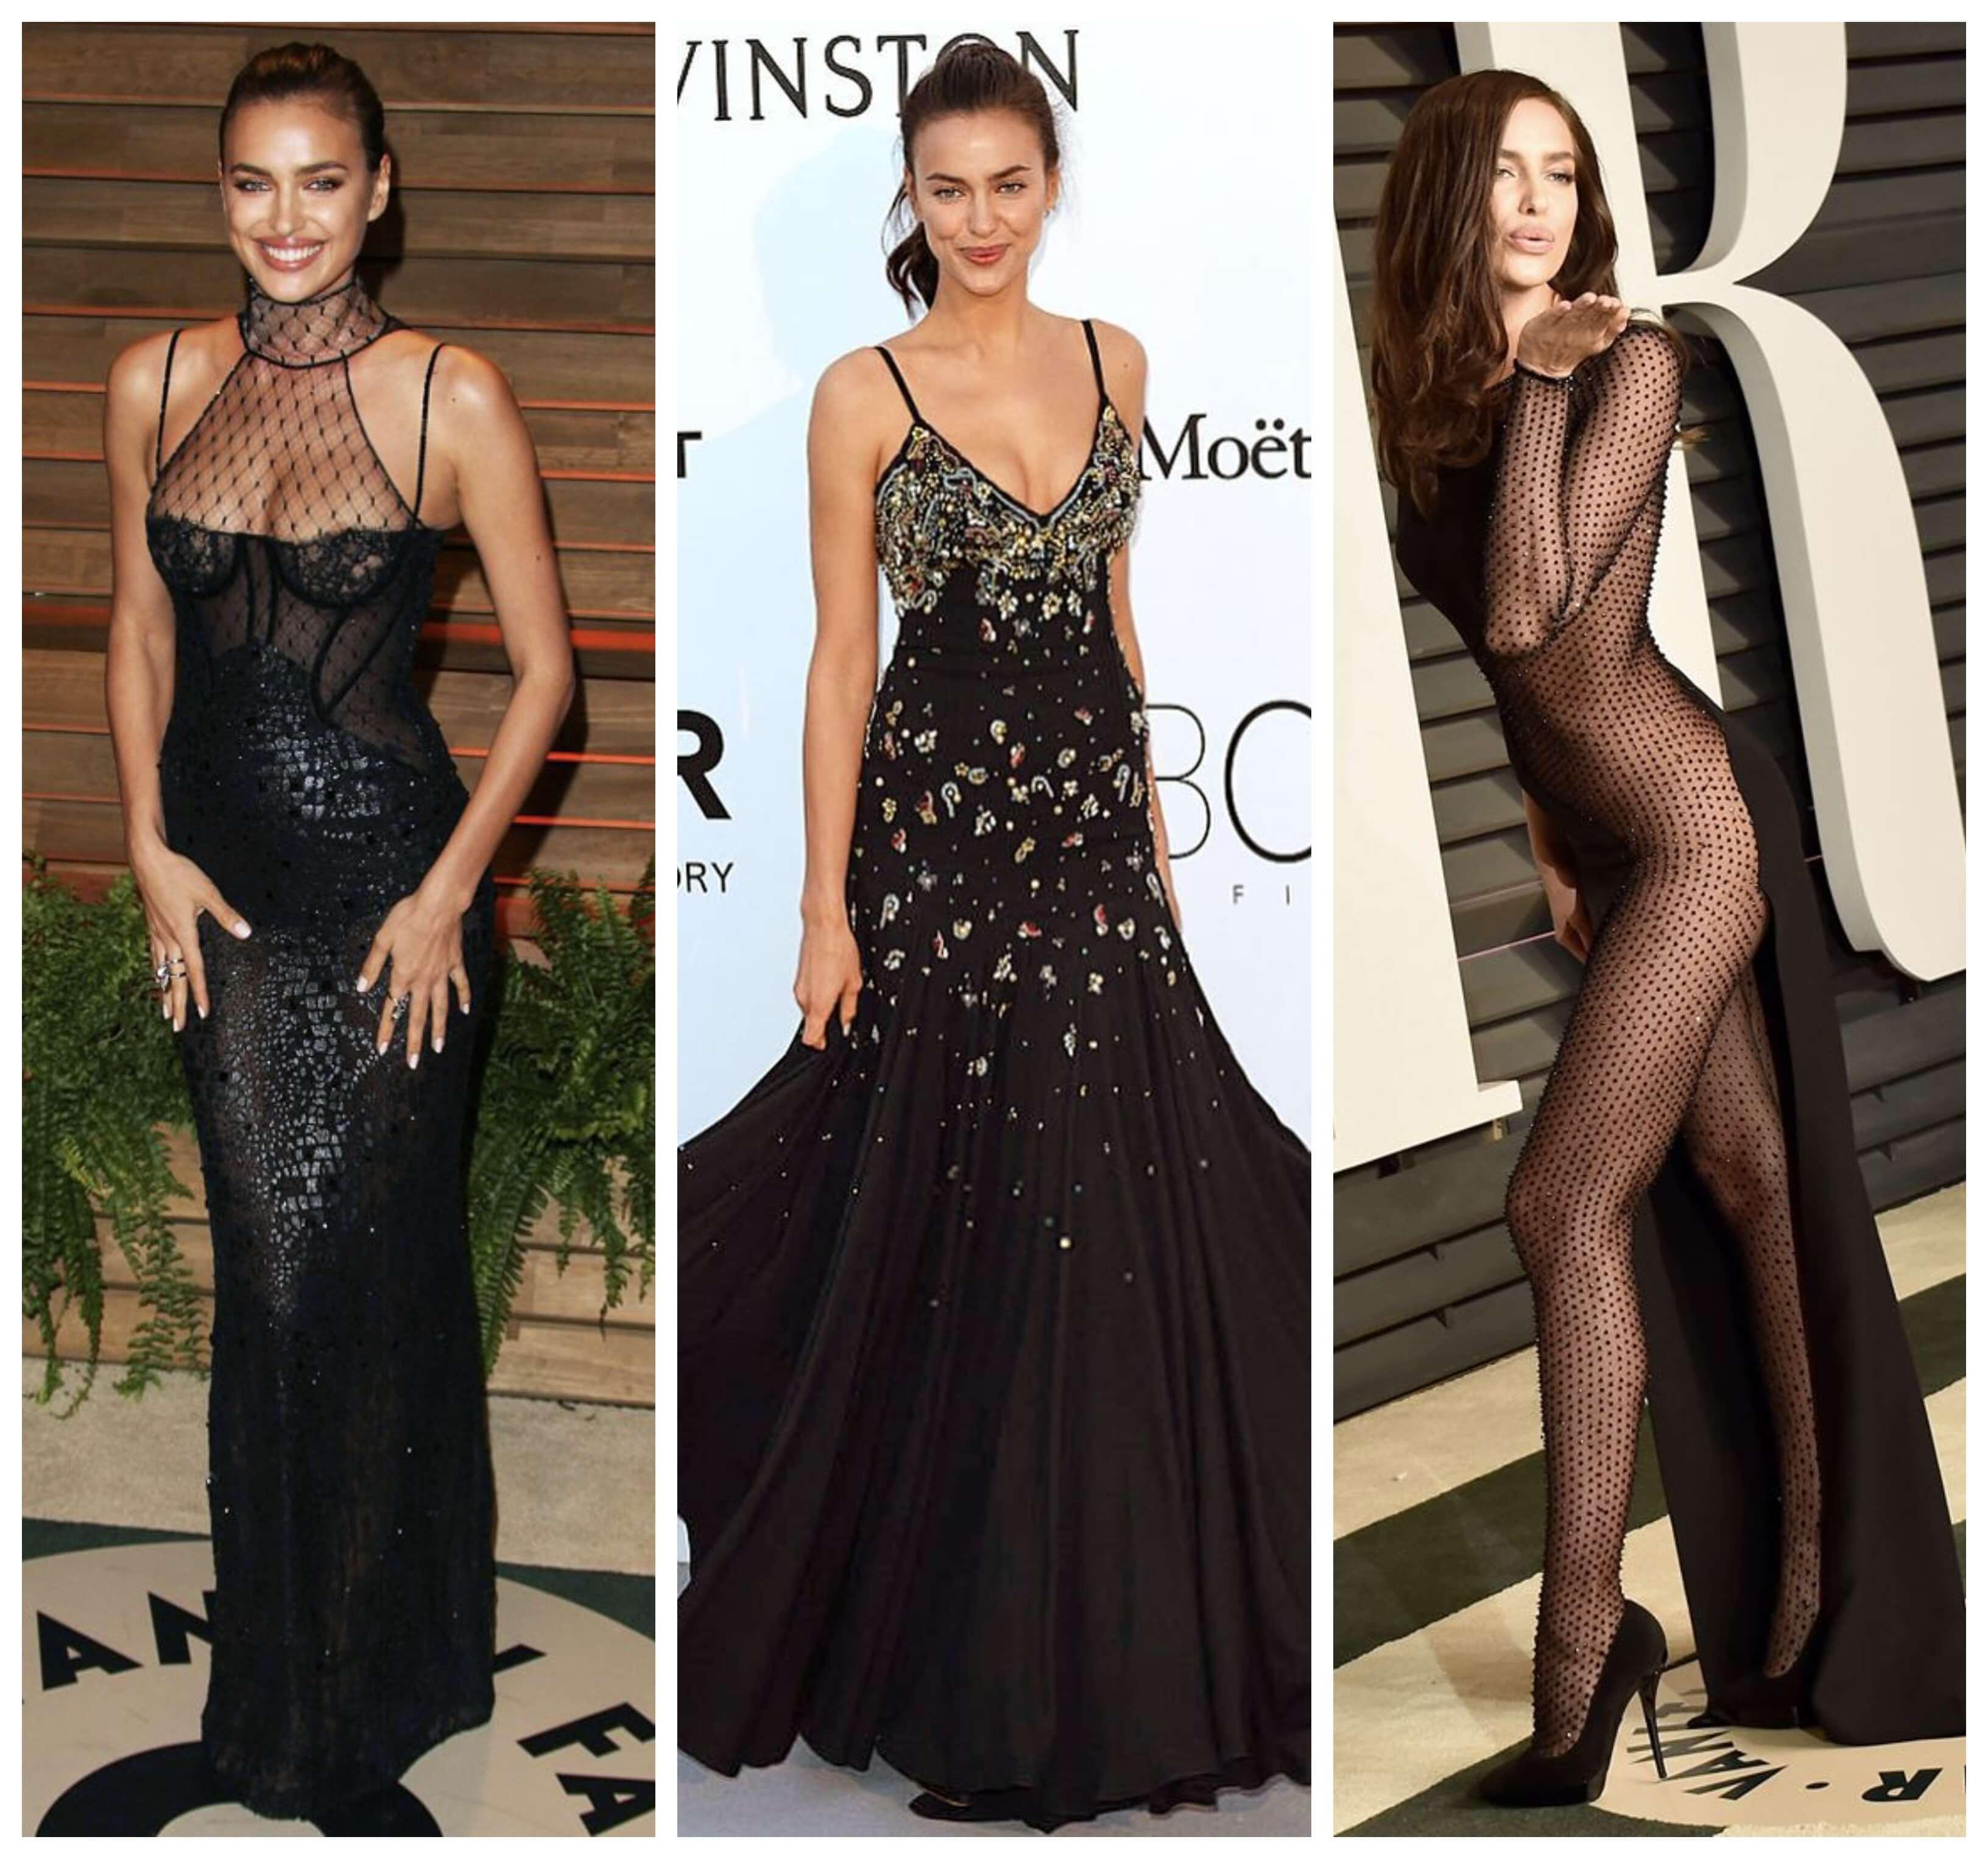 La supermodelo rusa con vestidos negros.